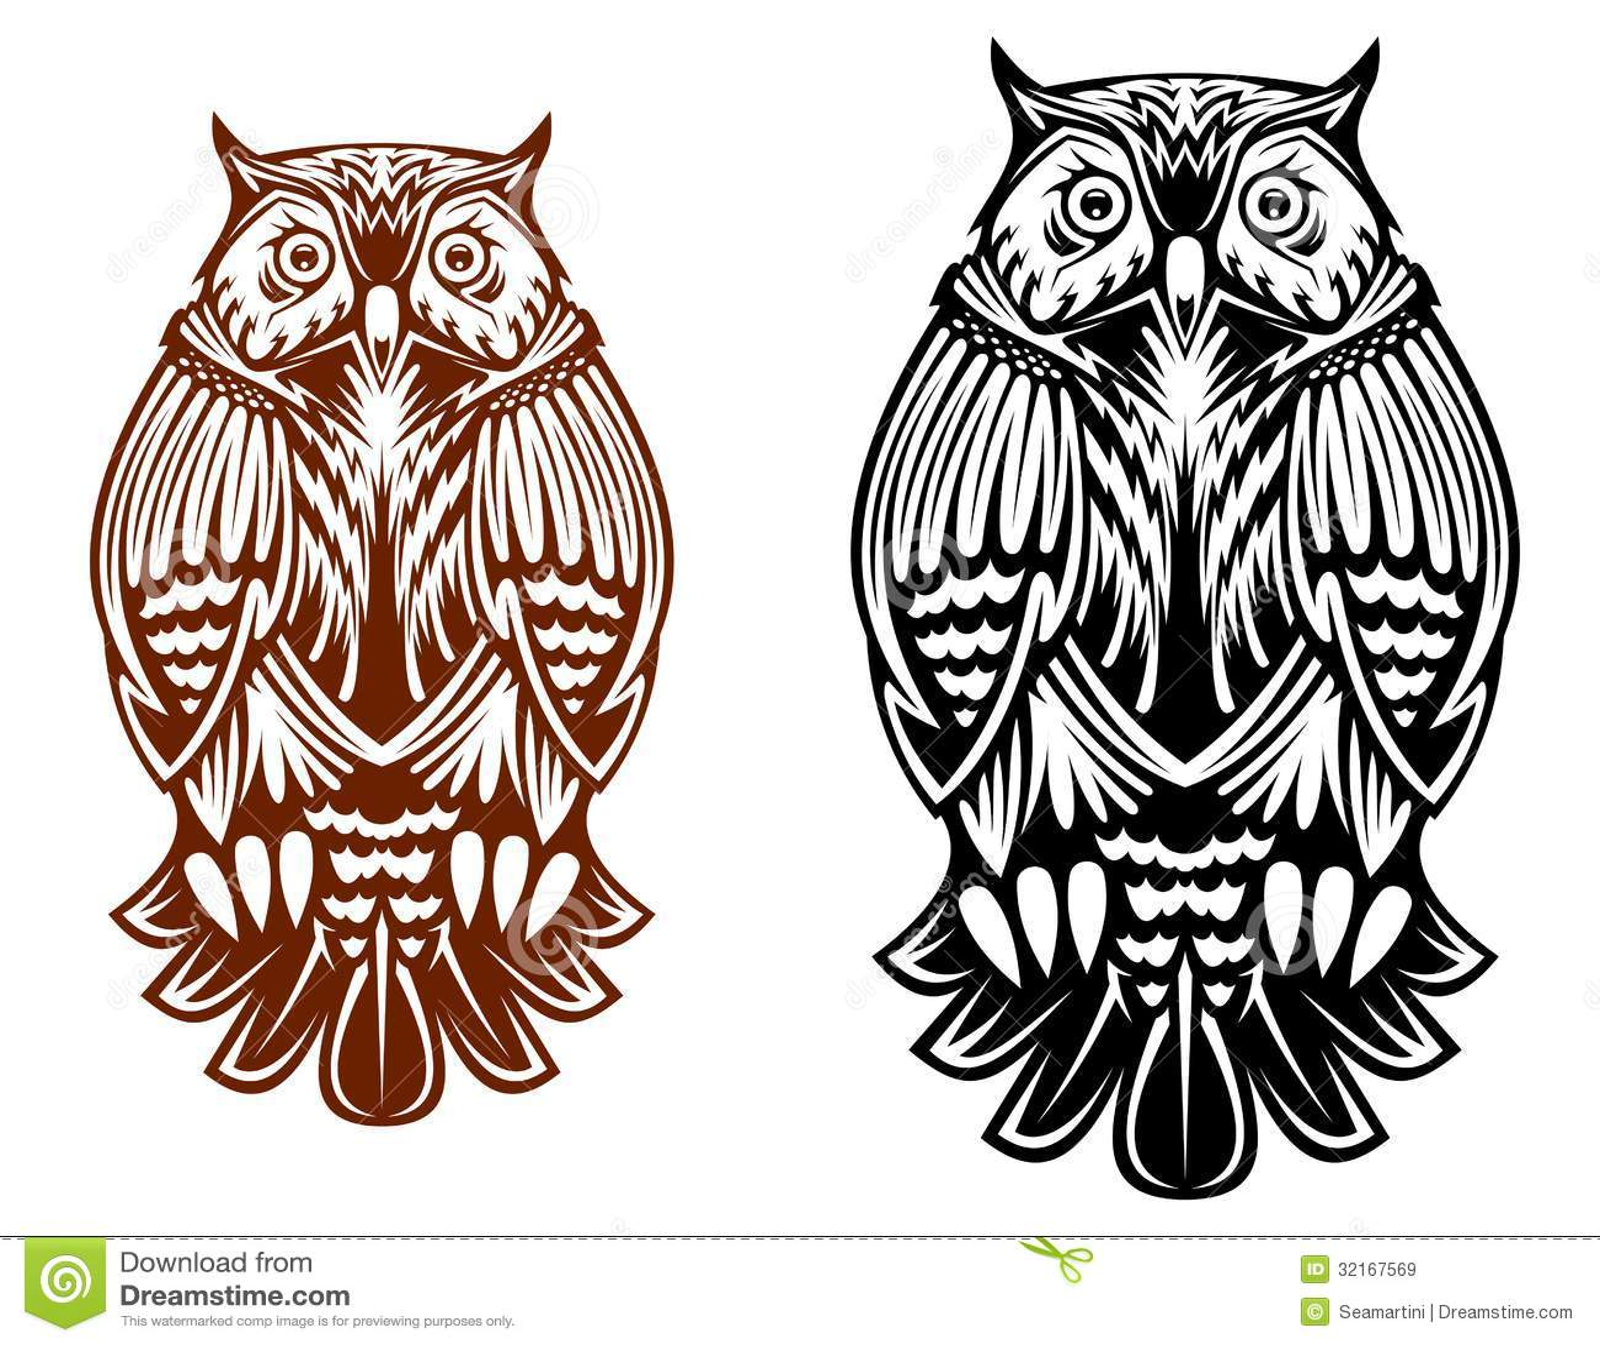 Beautiful Owl Mascot Stock Vector. Illustration Of